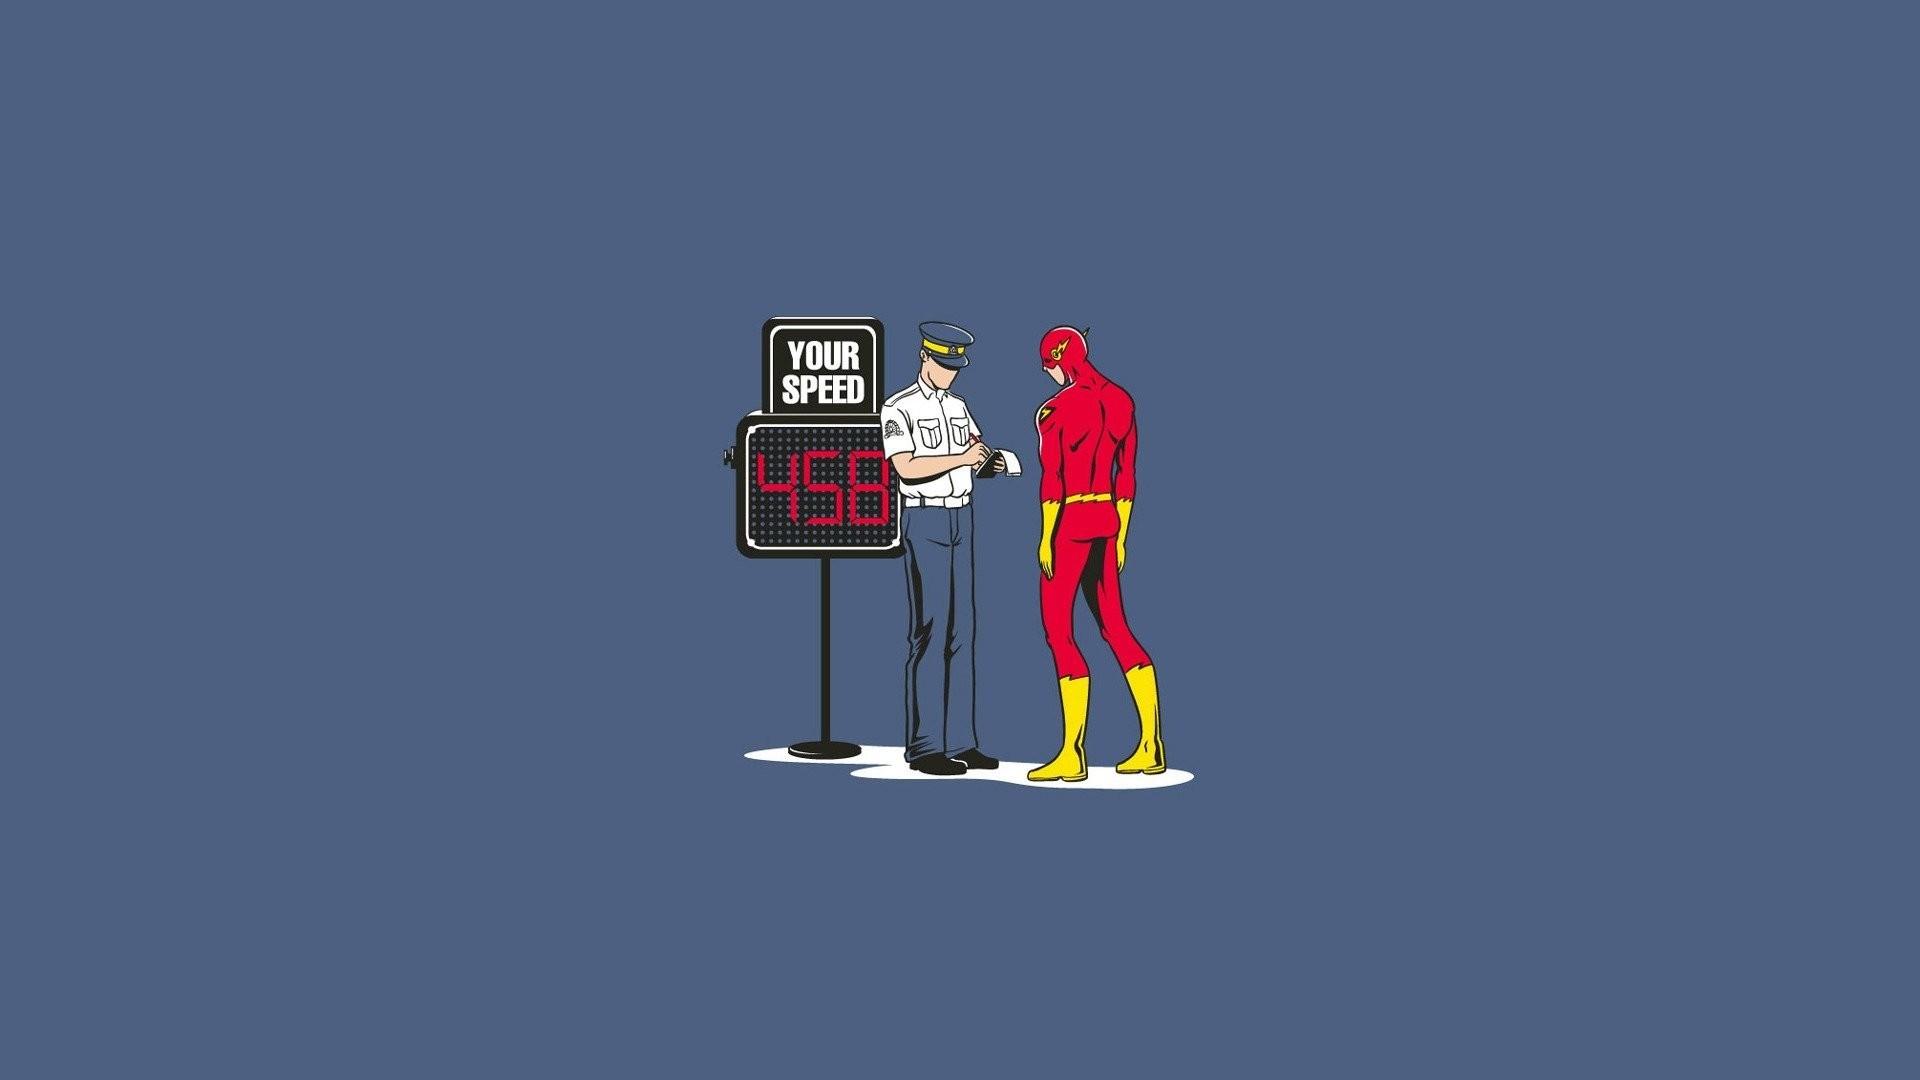 the flash dc comics comics humor adult police super hero speed fine